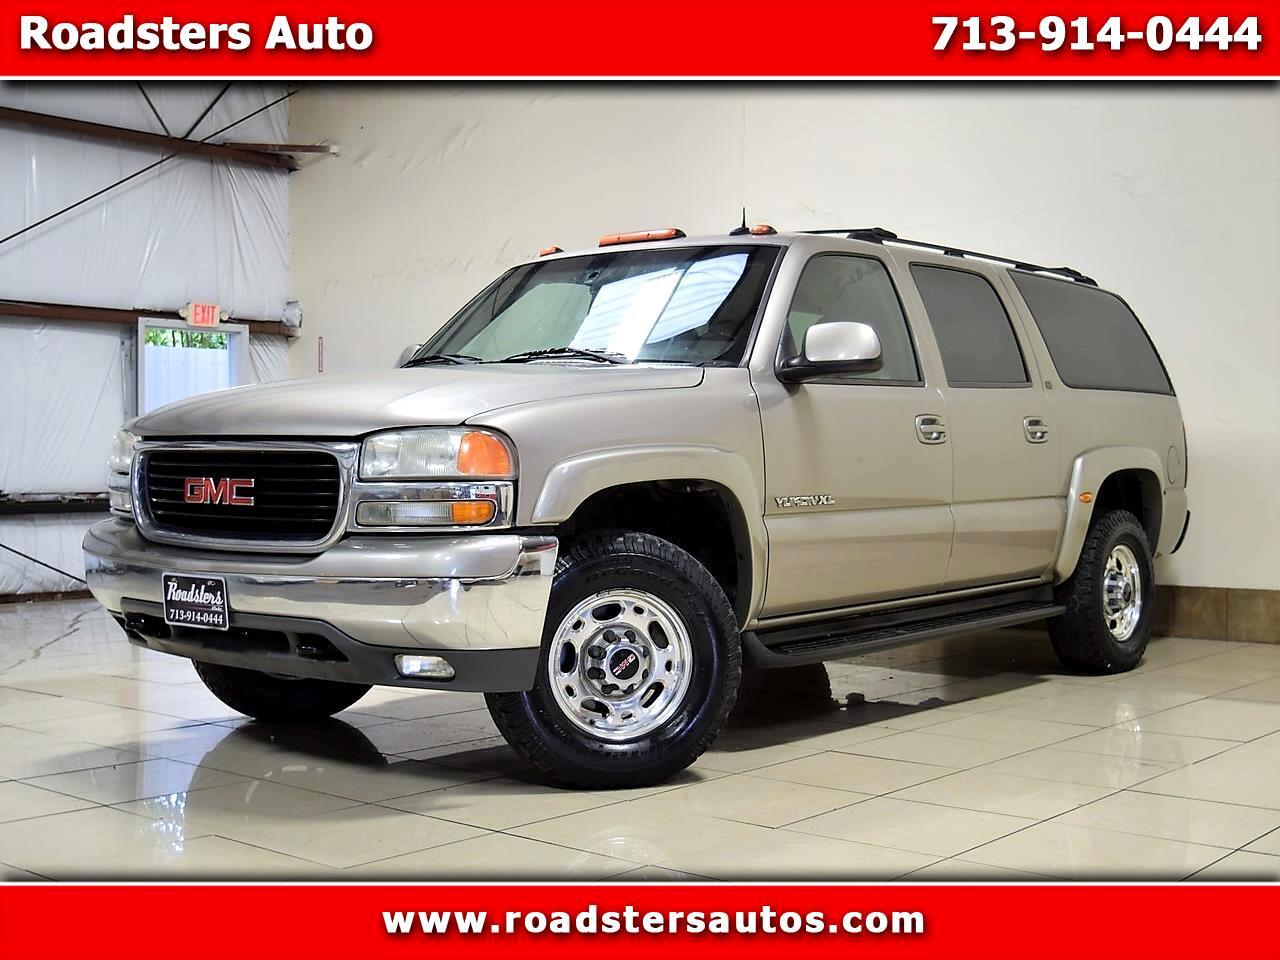 2003 GMC Yukon XL 2500 4WD